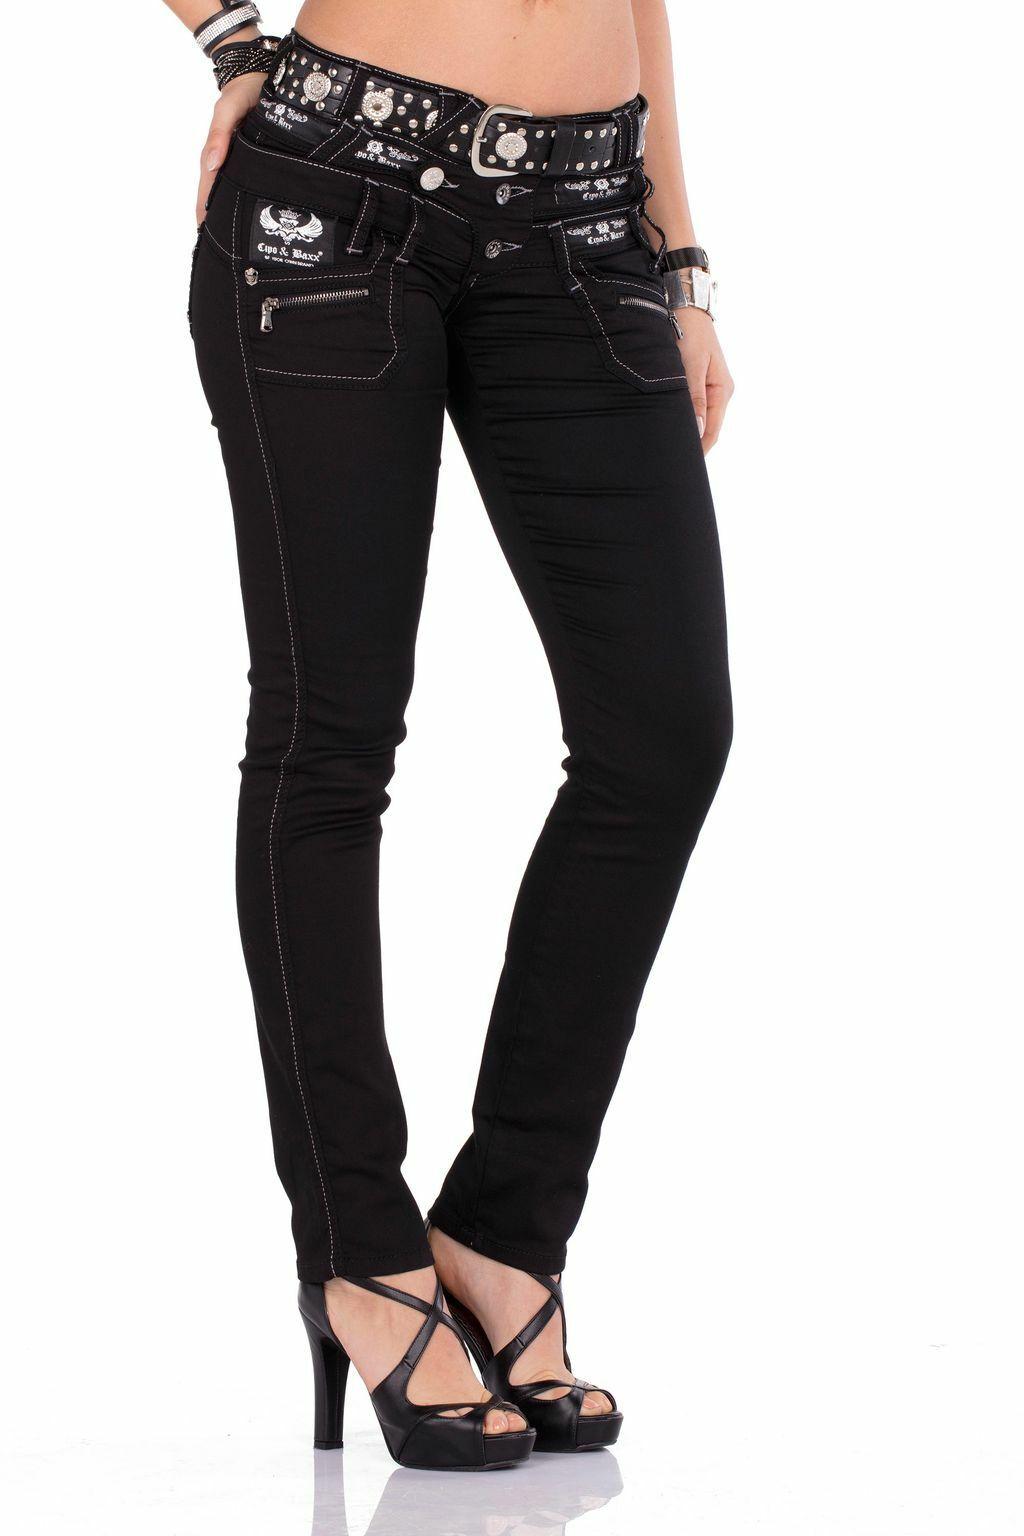 CIPO & BAXX Jeans da da da donna cbw-0313 cbw-313 Nera Slim Fit con o senza cintura 20d2f4